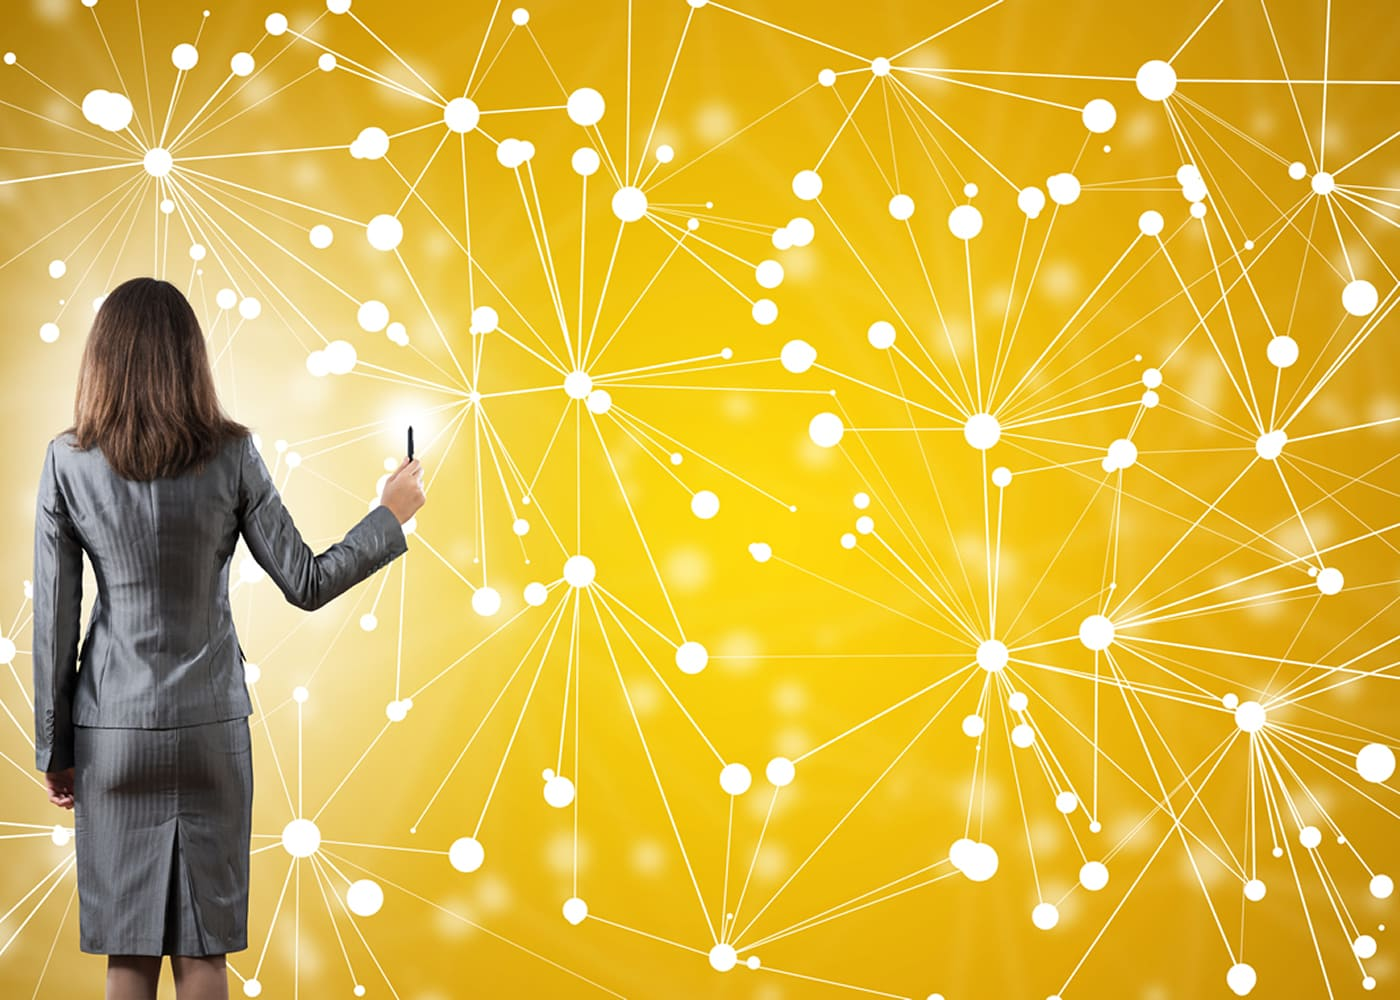 naem-webinar-2017-leadership-webinar-series-building-your-tribe-through-networking-and-mentoring-700x500